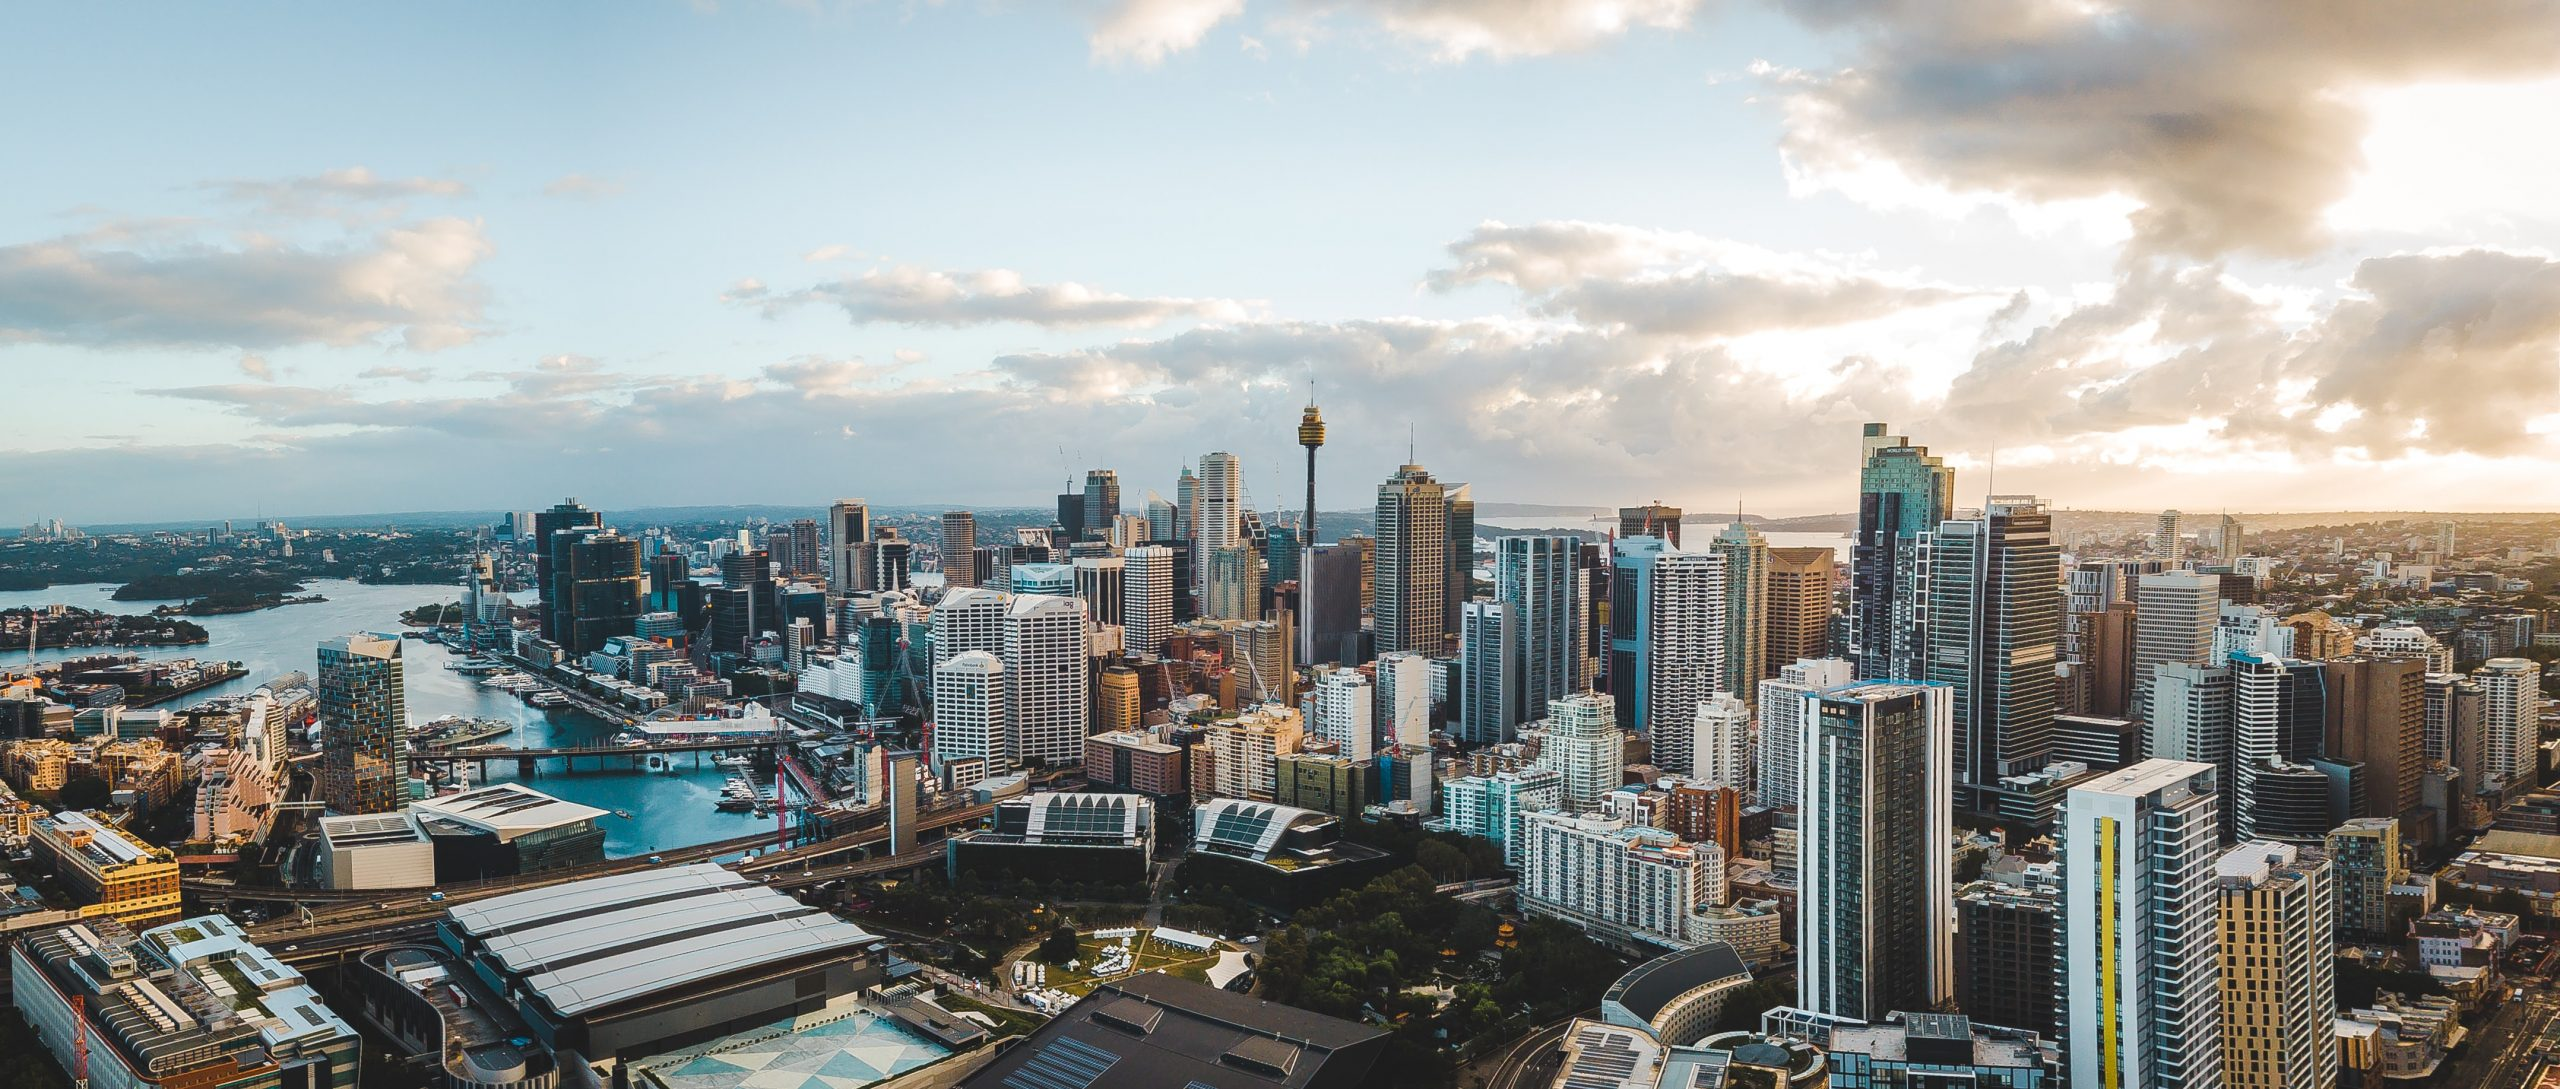 Sydney lockdown lifts